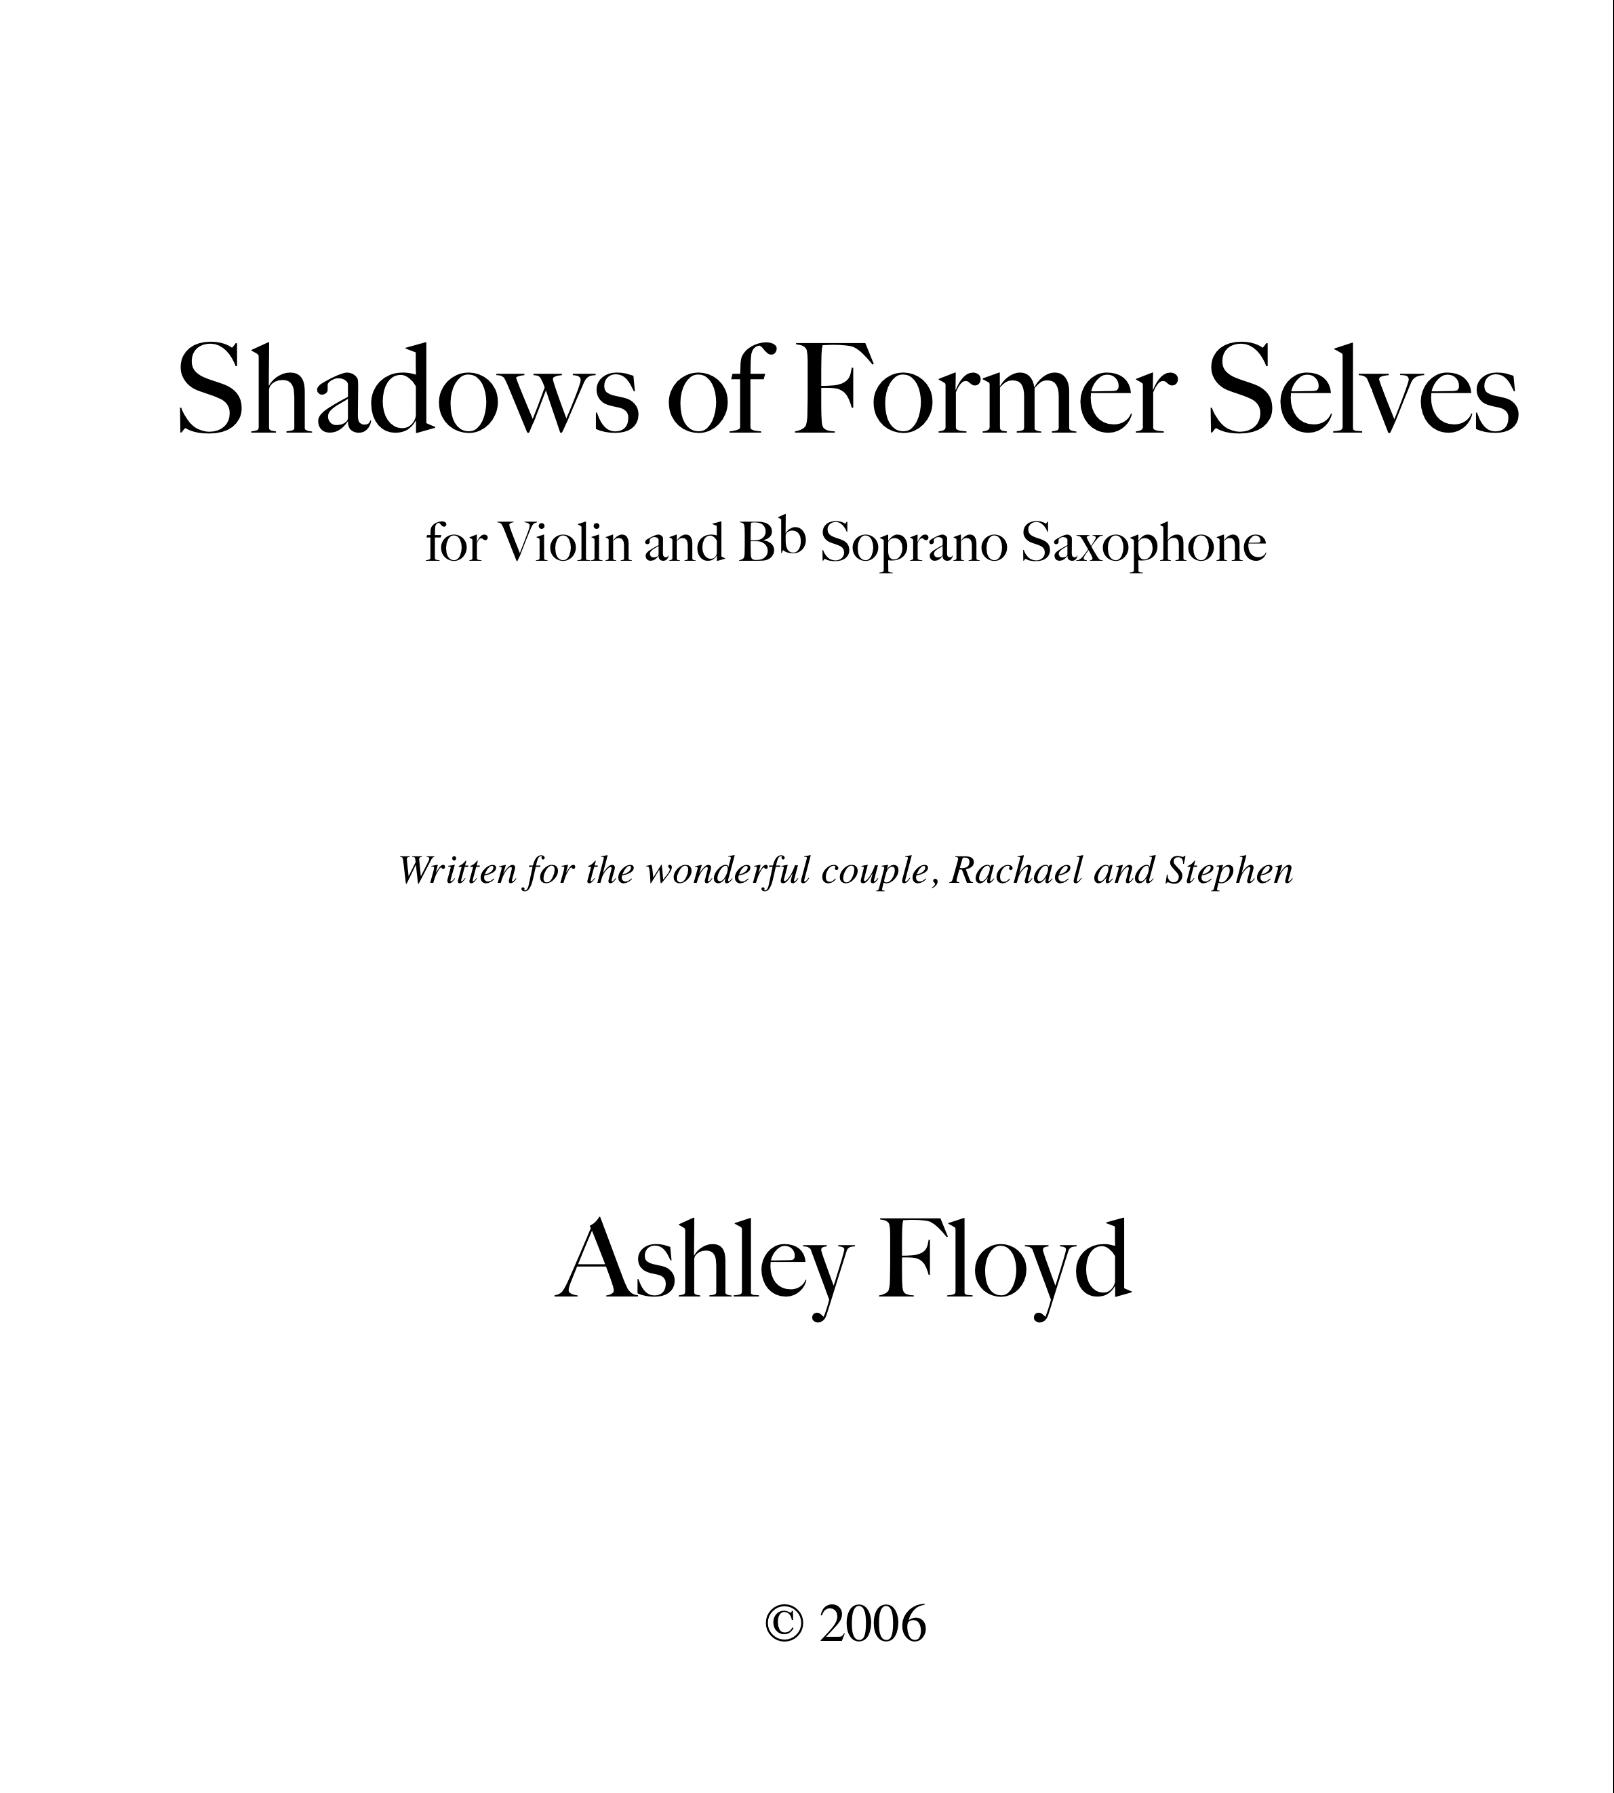 Shadows Of Former Selves  by Ashley Floyd